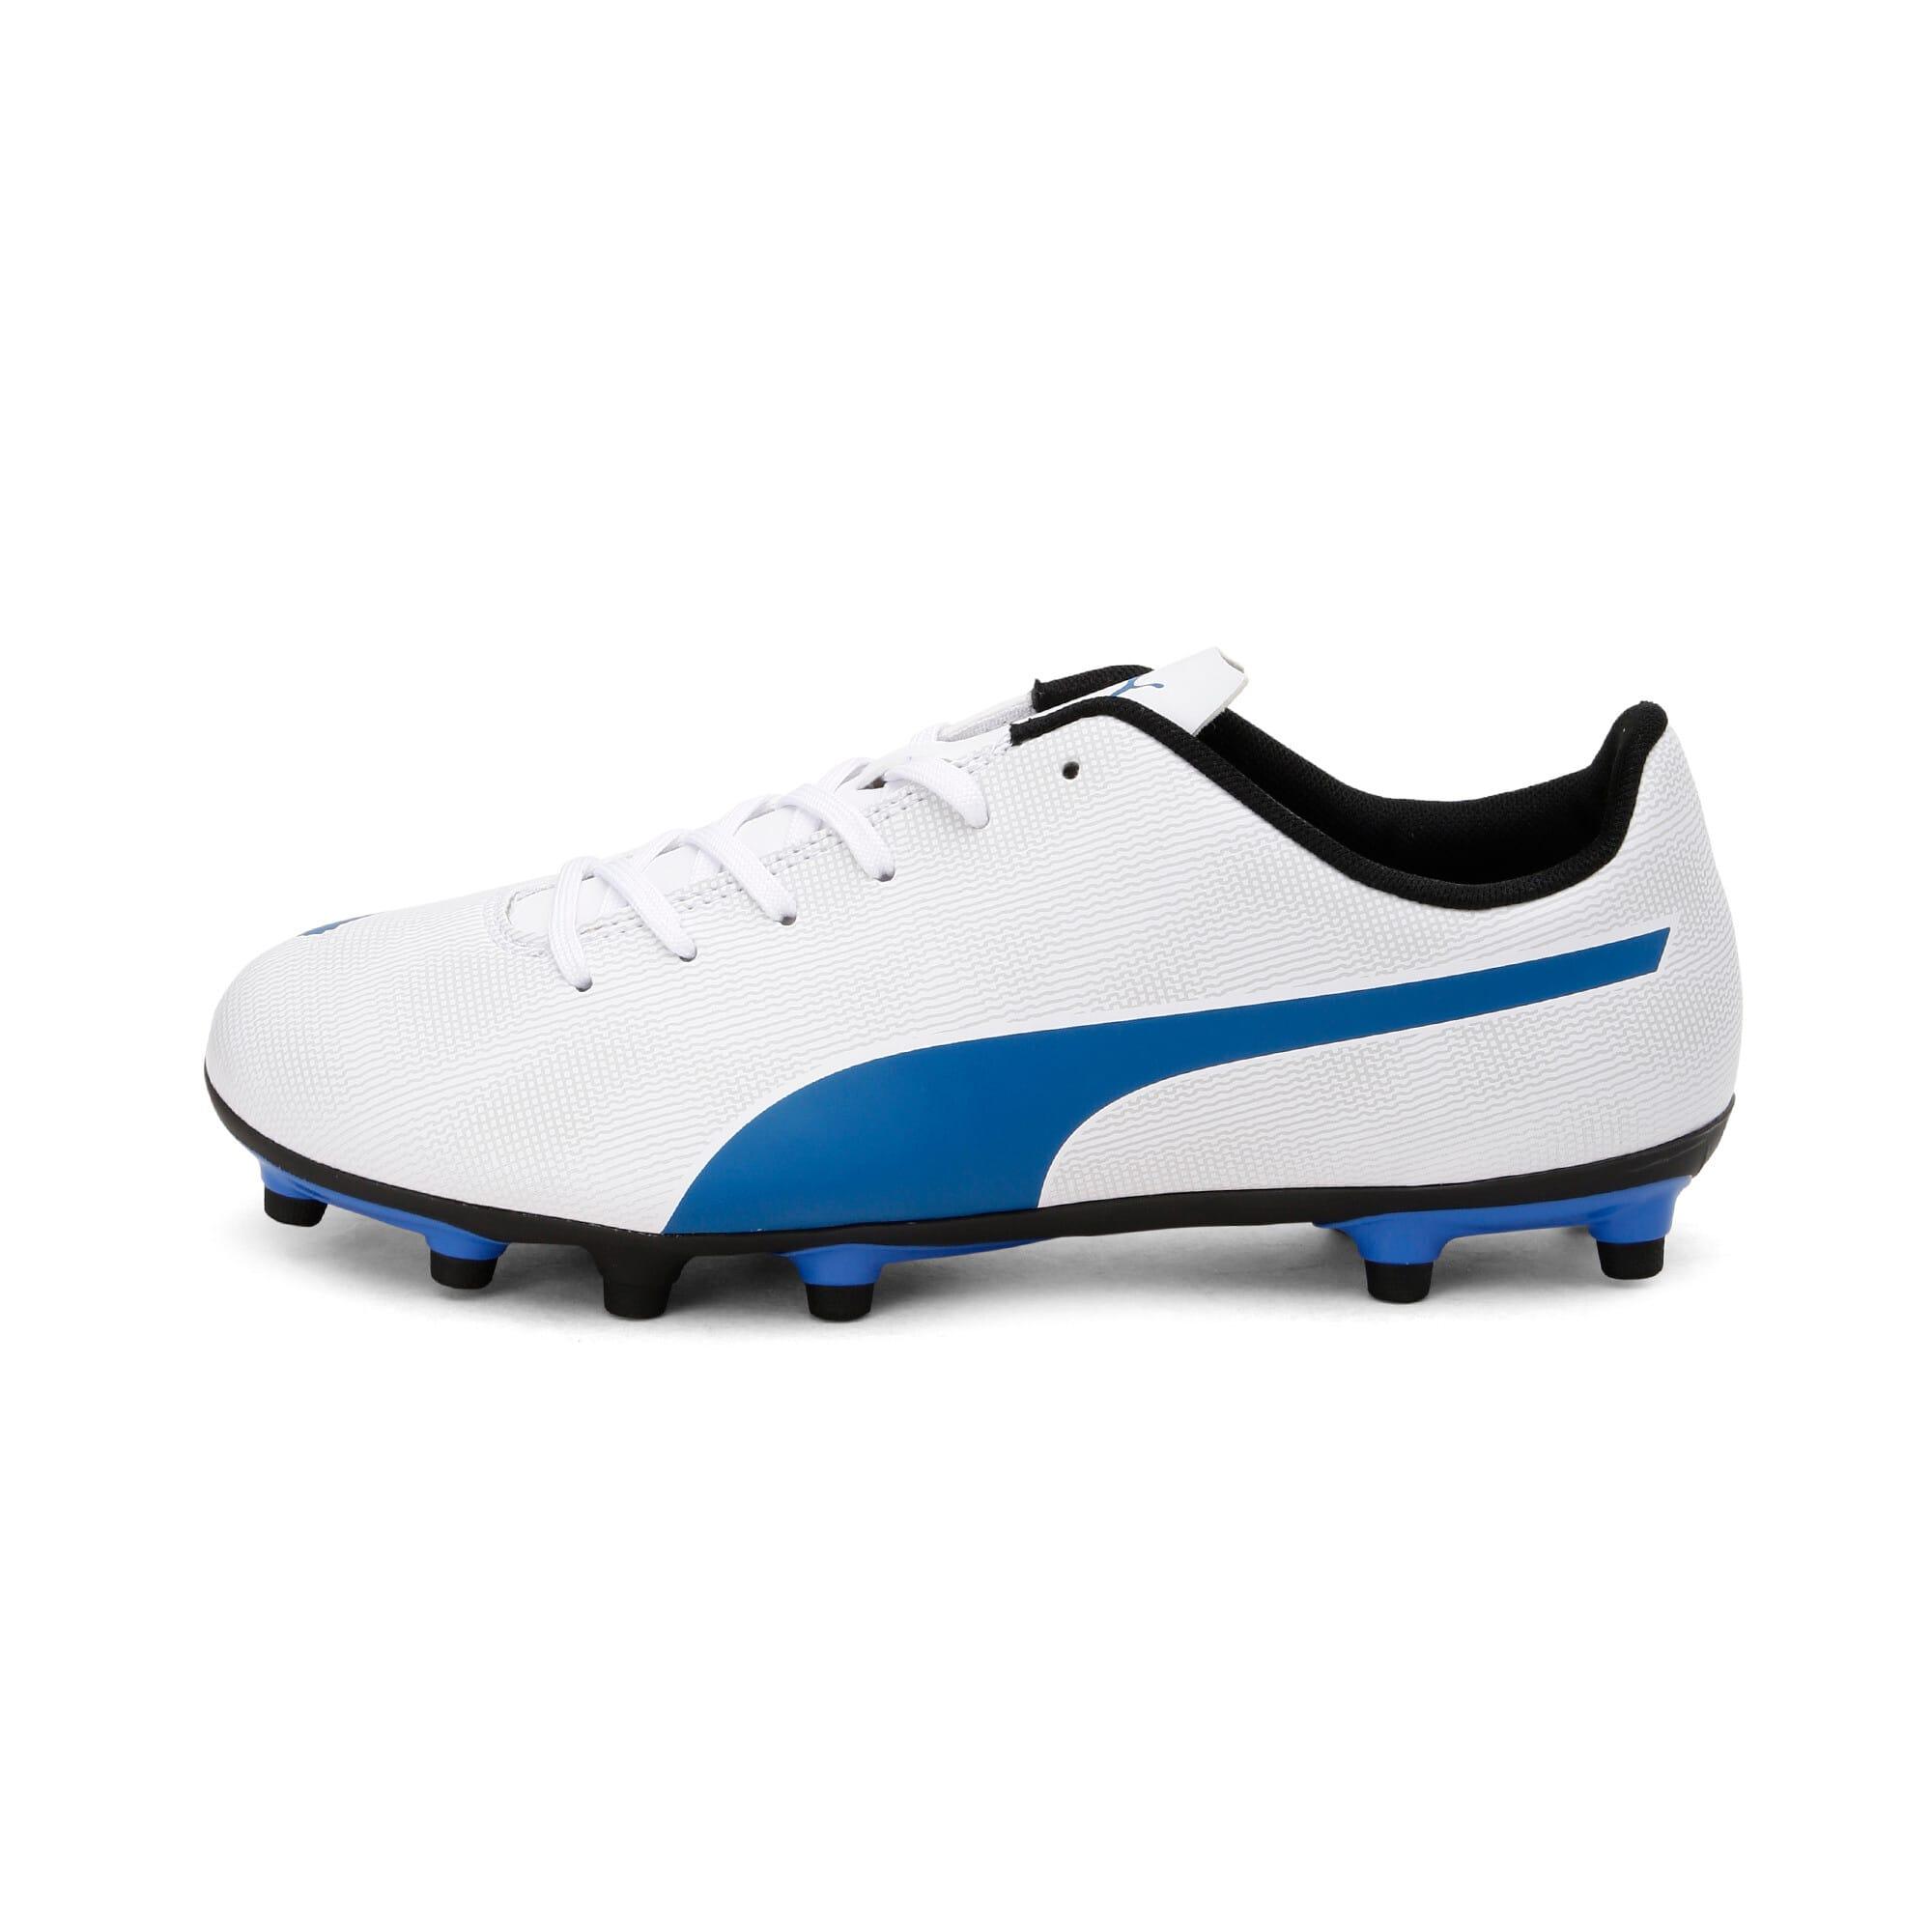 Thumbnail 1 of Rapido FG Youth Football Boots, White-Royal Blue-Light Gray, medium-IND